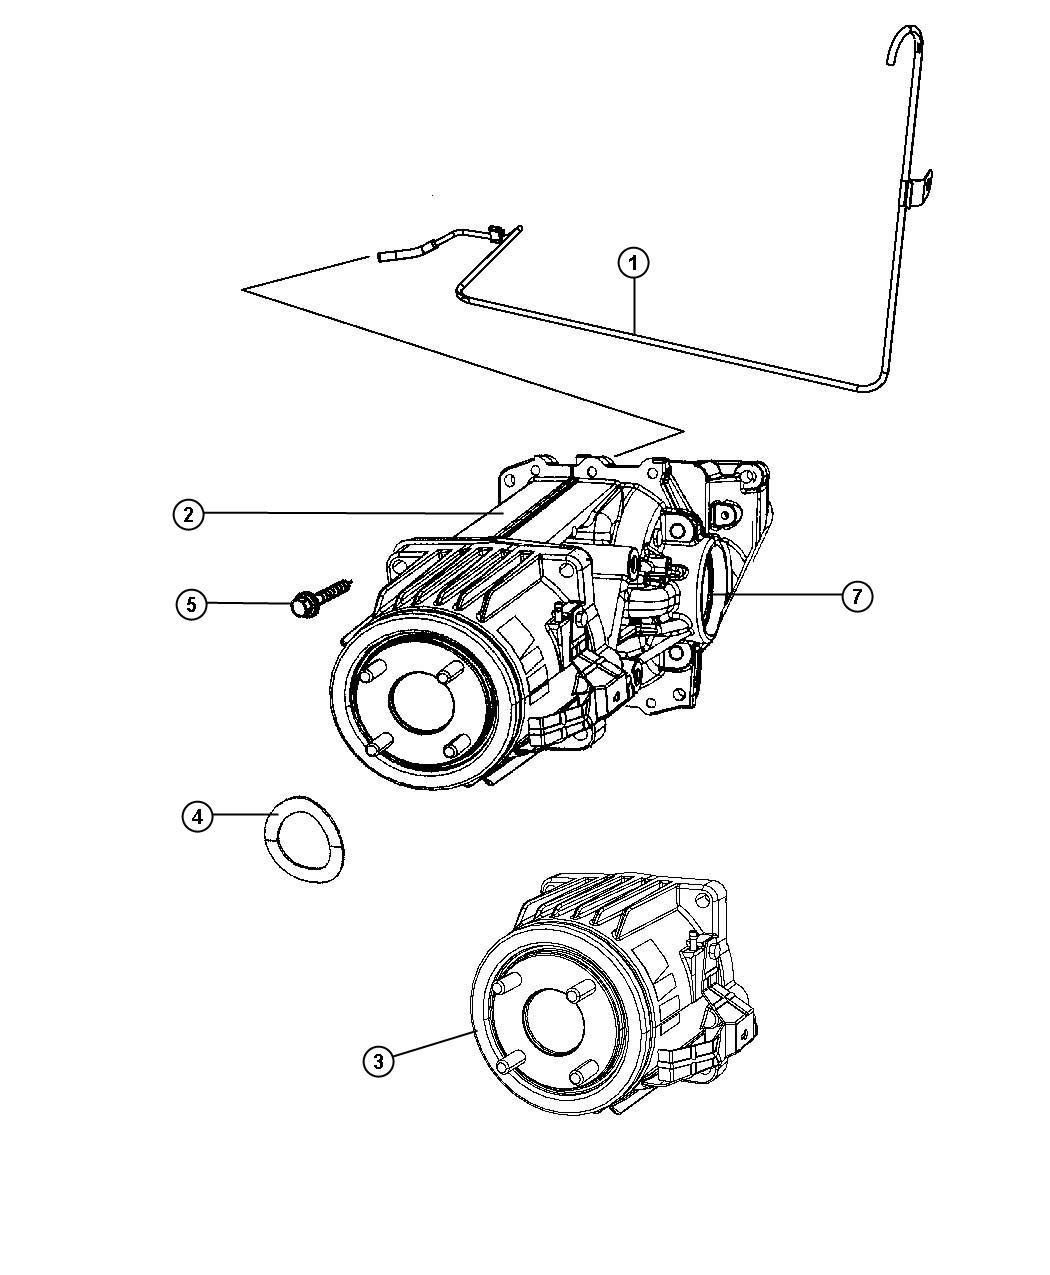 Jeep Patriot Coupling Electric Clutch Contr W